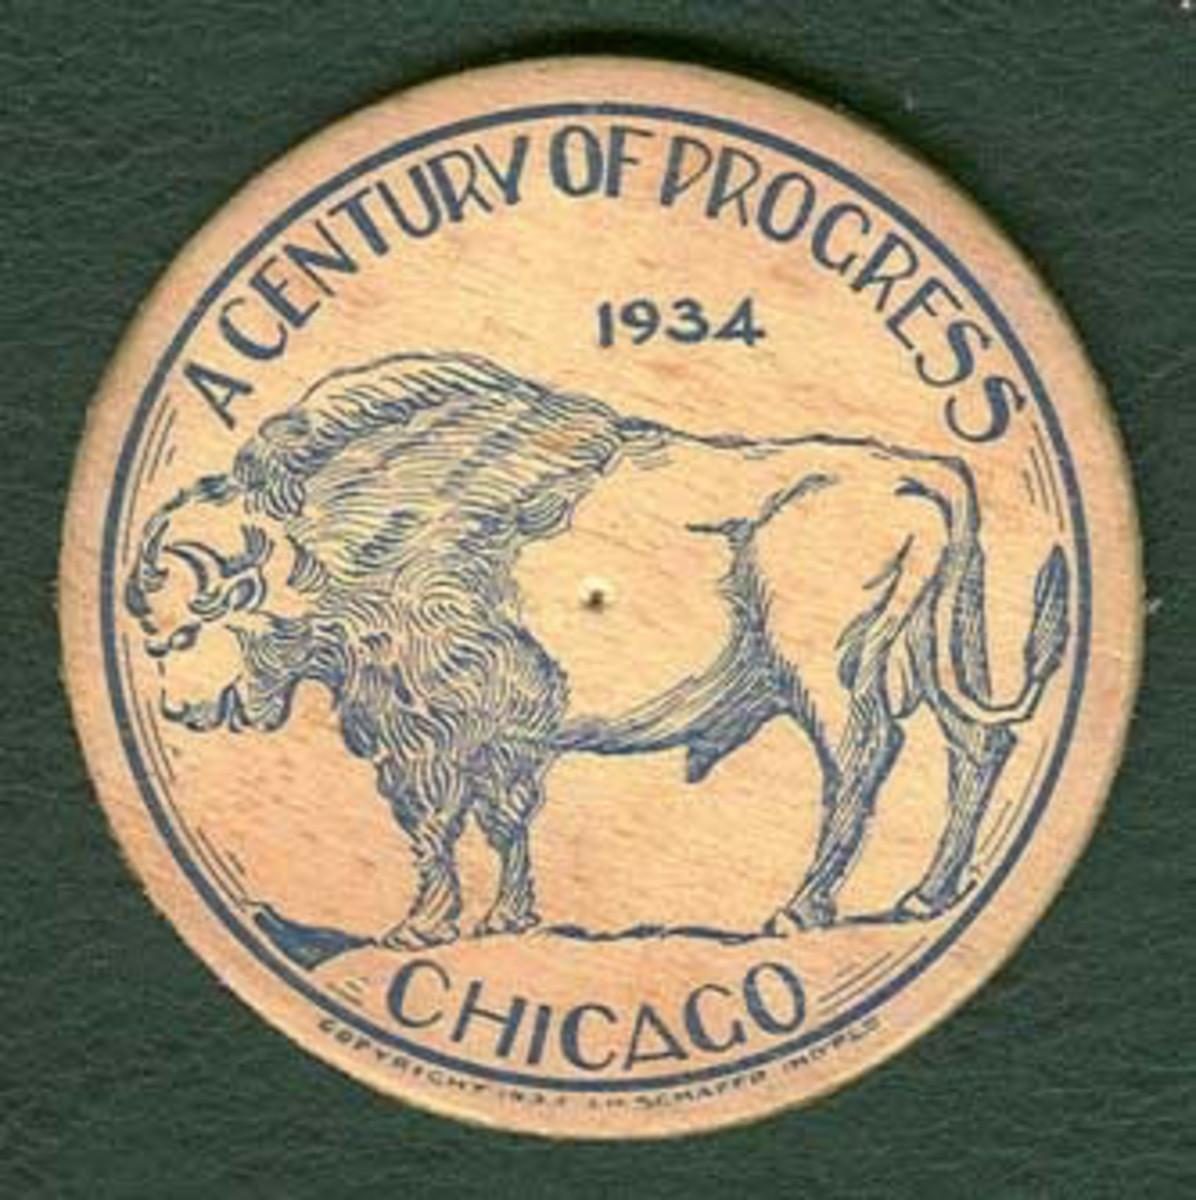 Wooden Nickel form the 1934 World's Fair